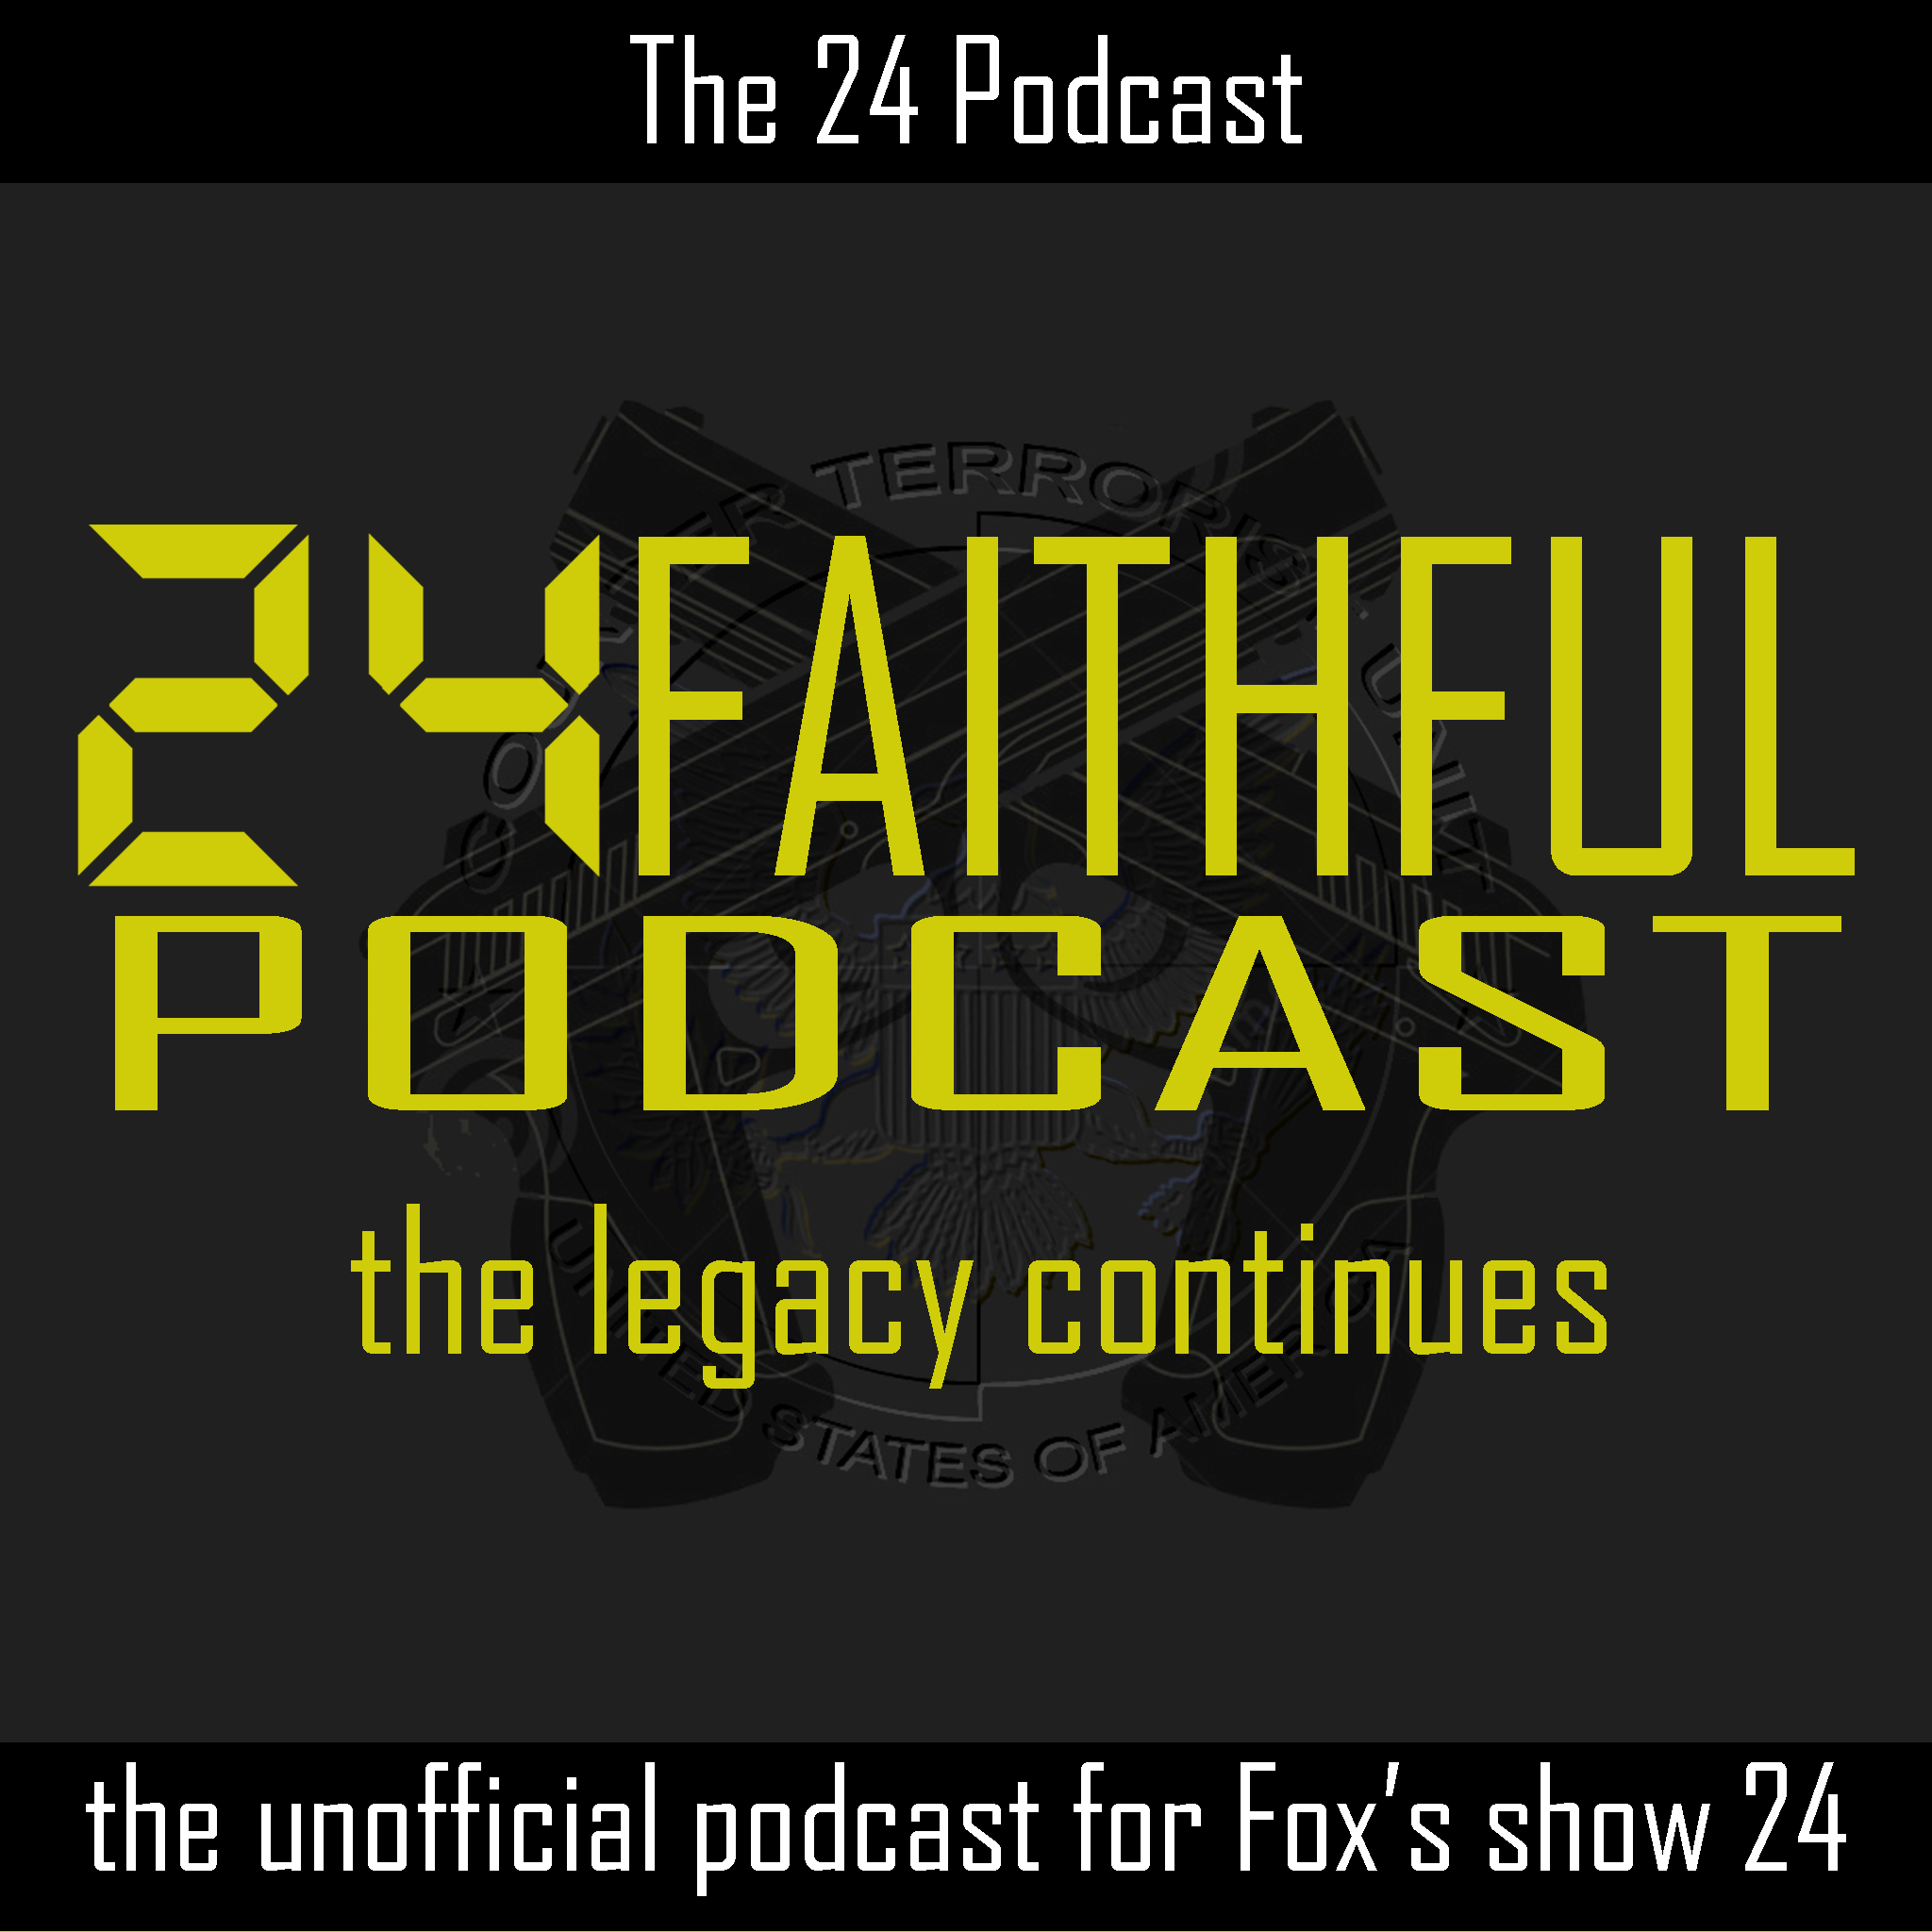 Artwork for podcast 24 Faithful Podcast